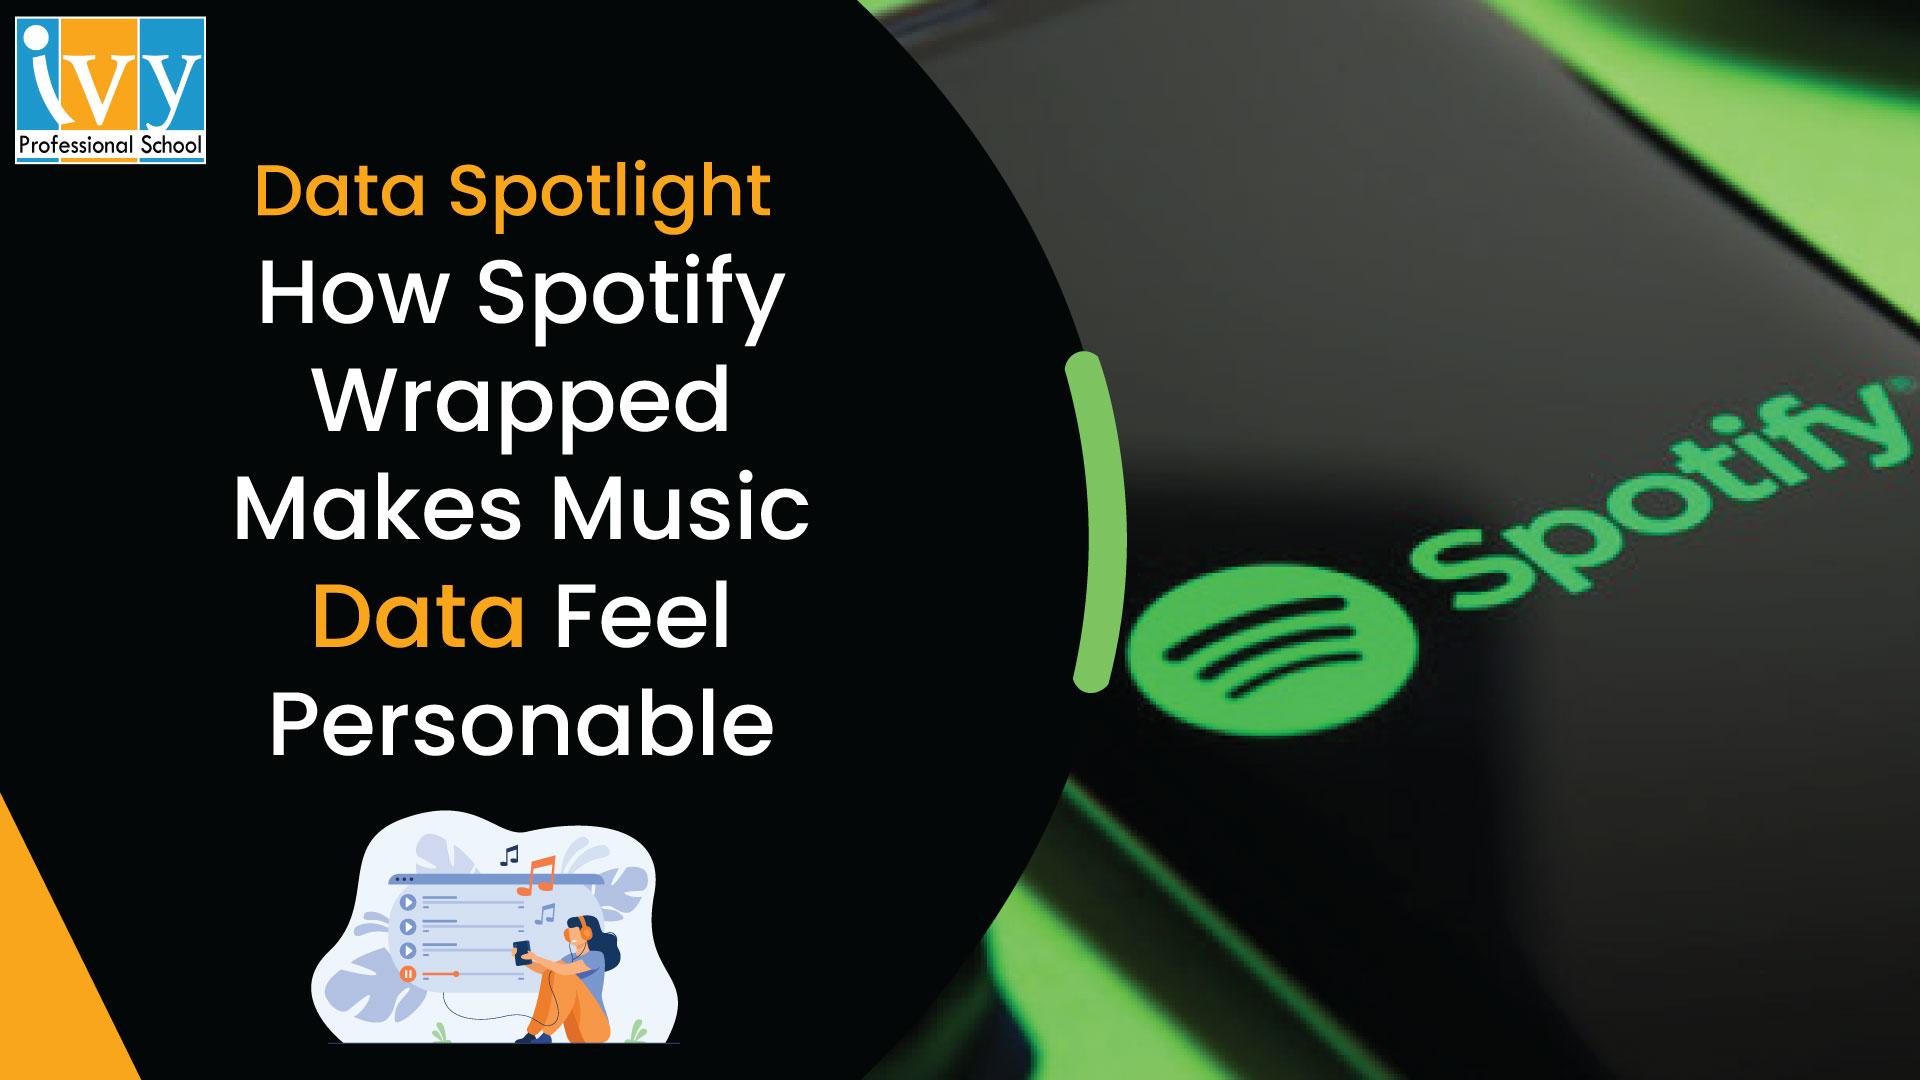 Data Spotlight- Shopify- Ivy Pro School